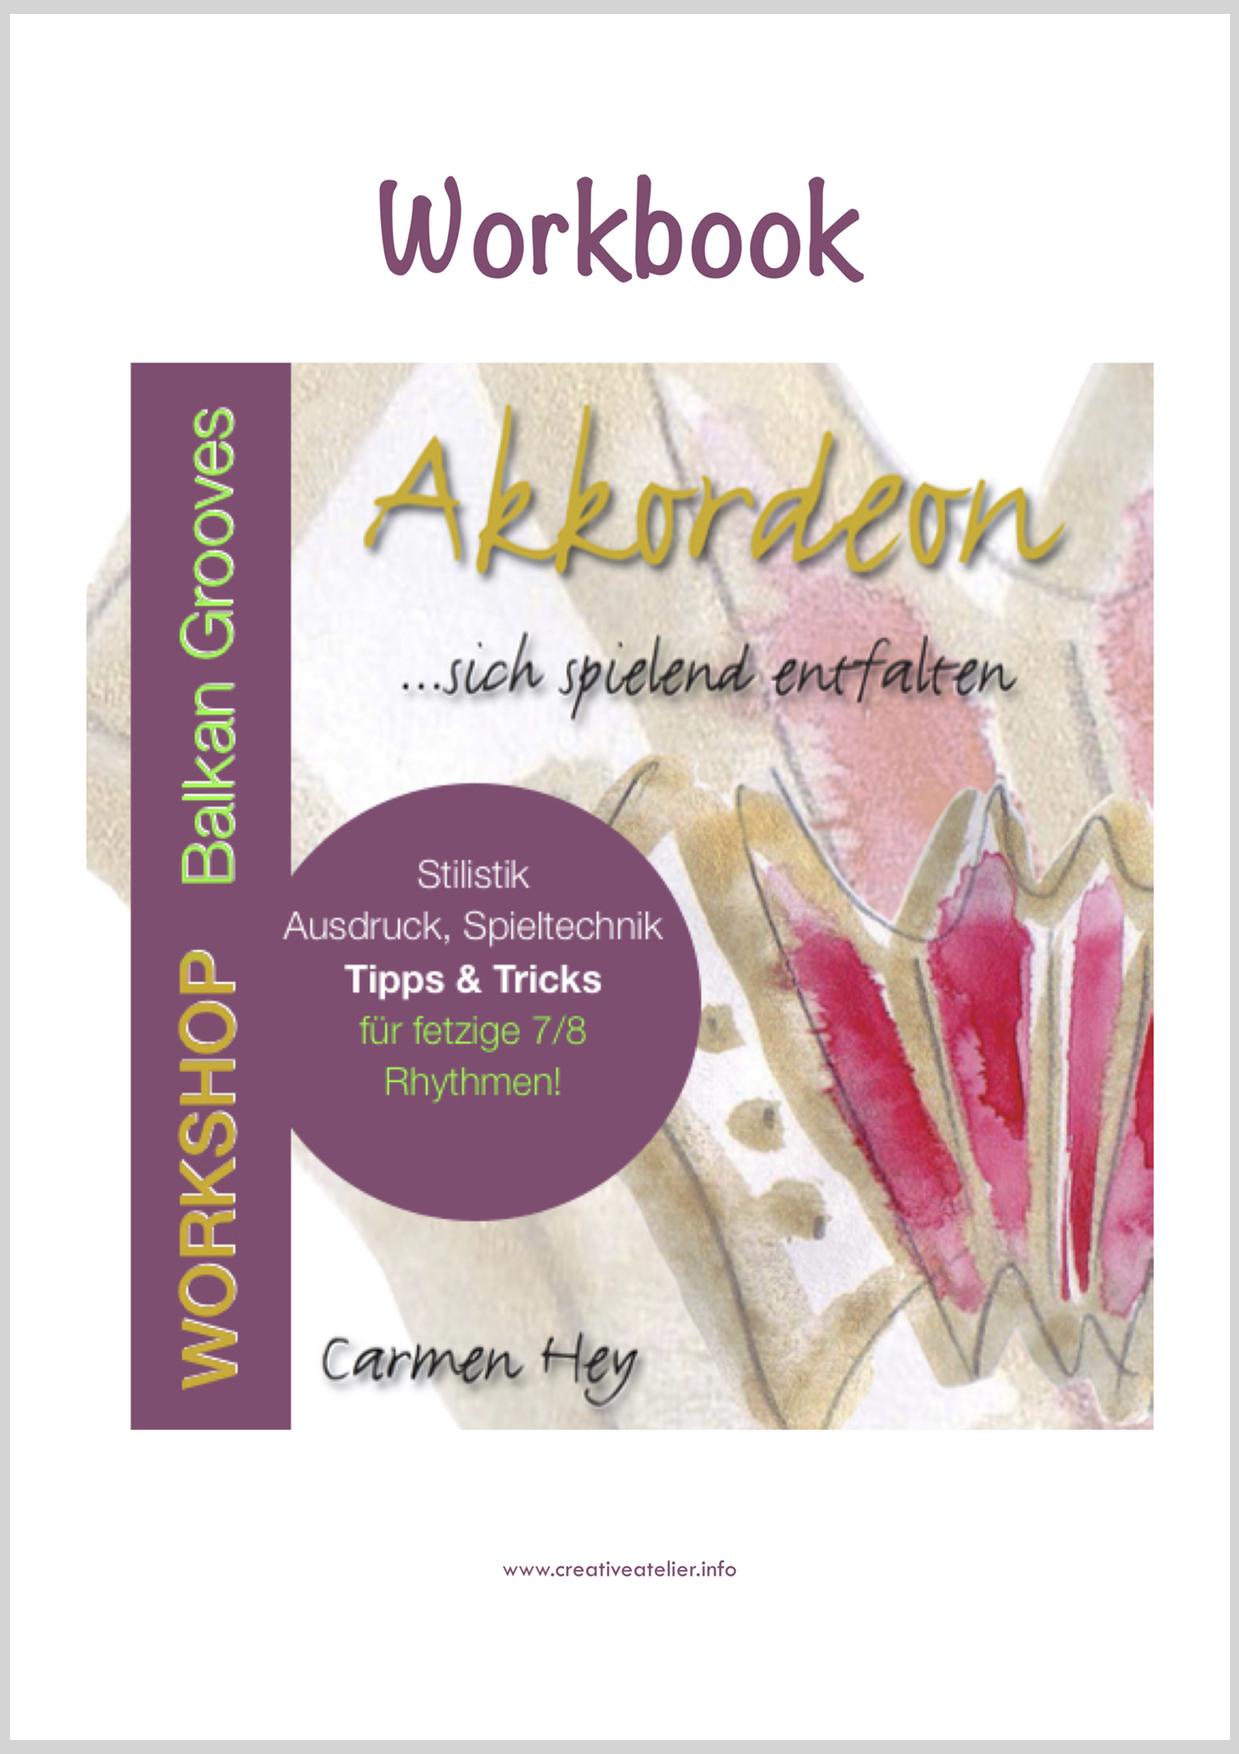 _Workbook